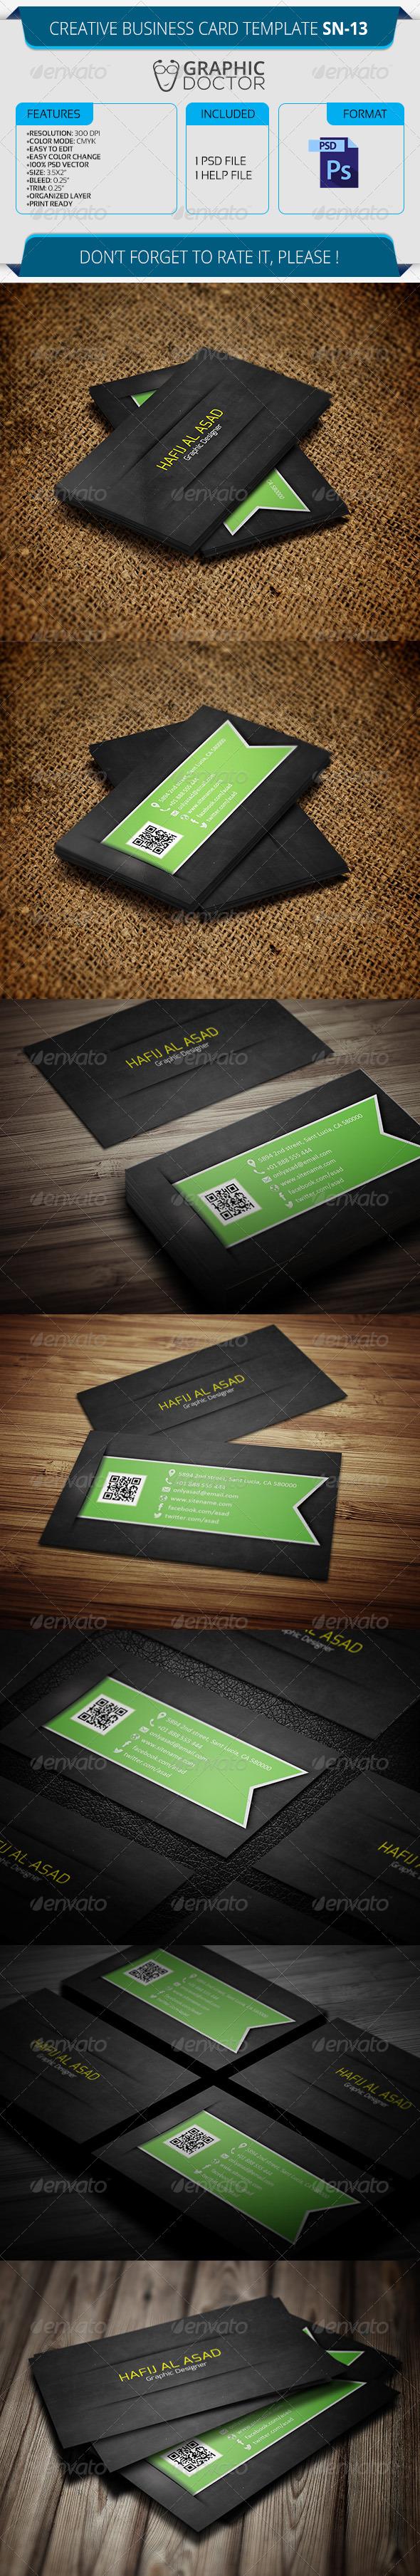 Creative Business Card Template SN-13 - Creative Business Cards